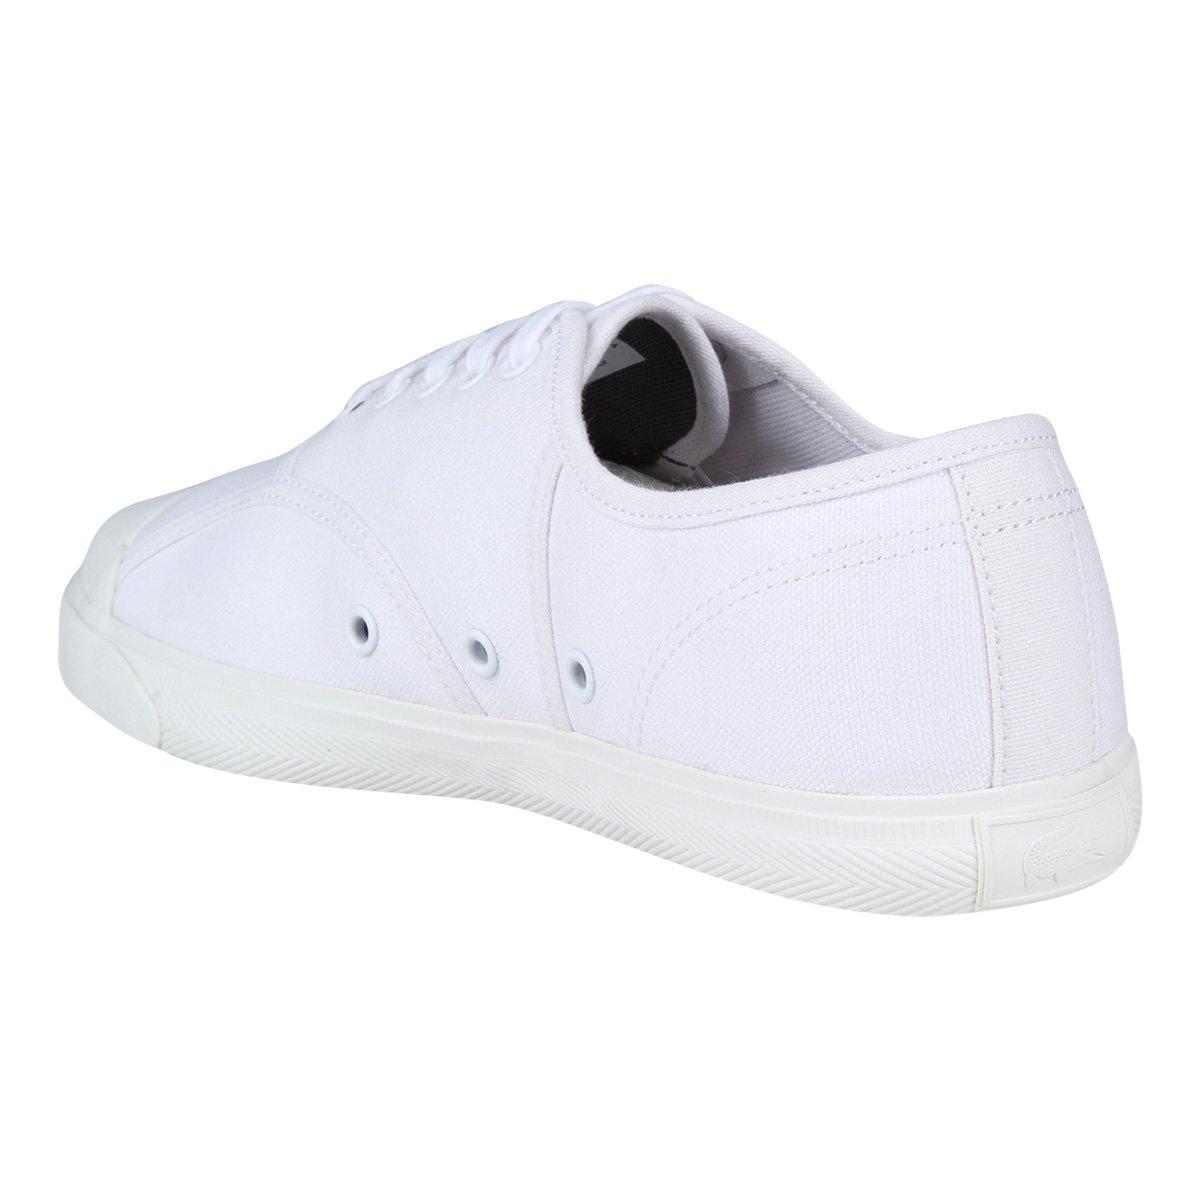 Tênis Lacoste René Feminino - Branco - Compre Agora   Netshoes 70294ce8cd